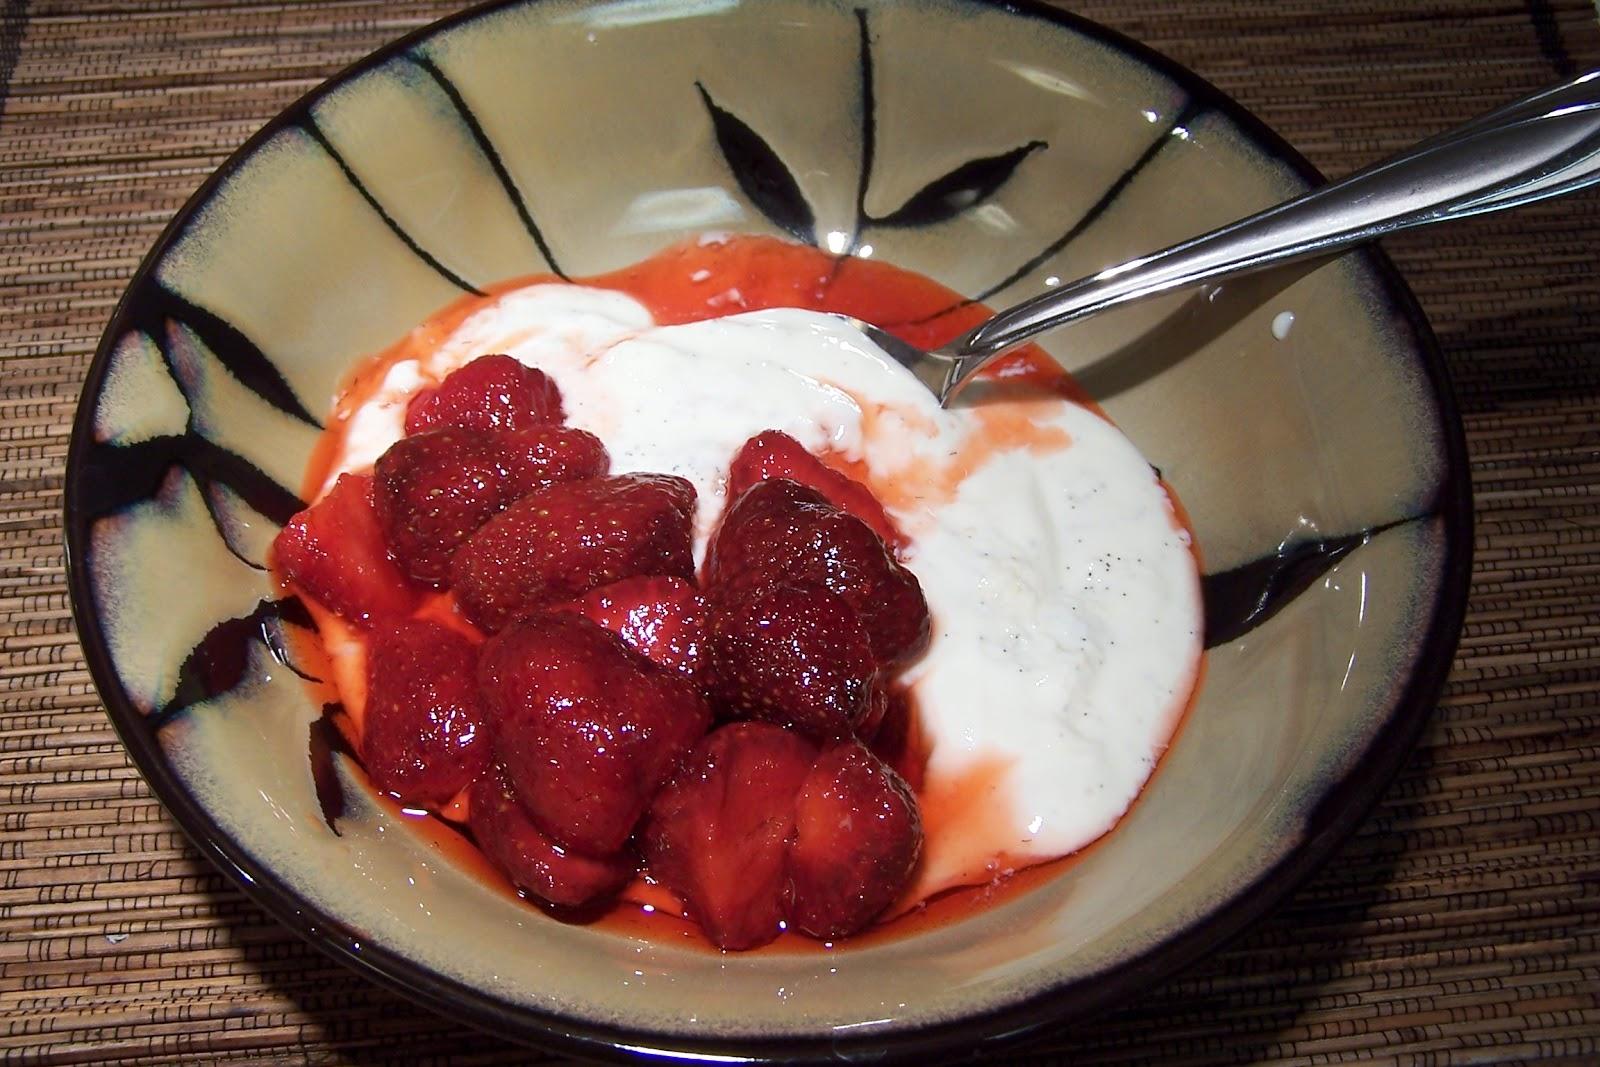 At Home On Paradise Cove: Homemade Vanilla Bean Yogurt